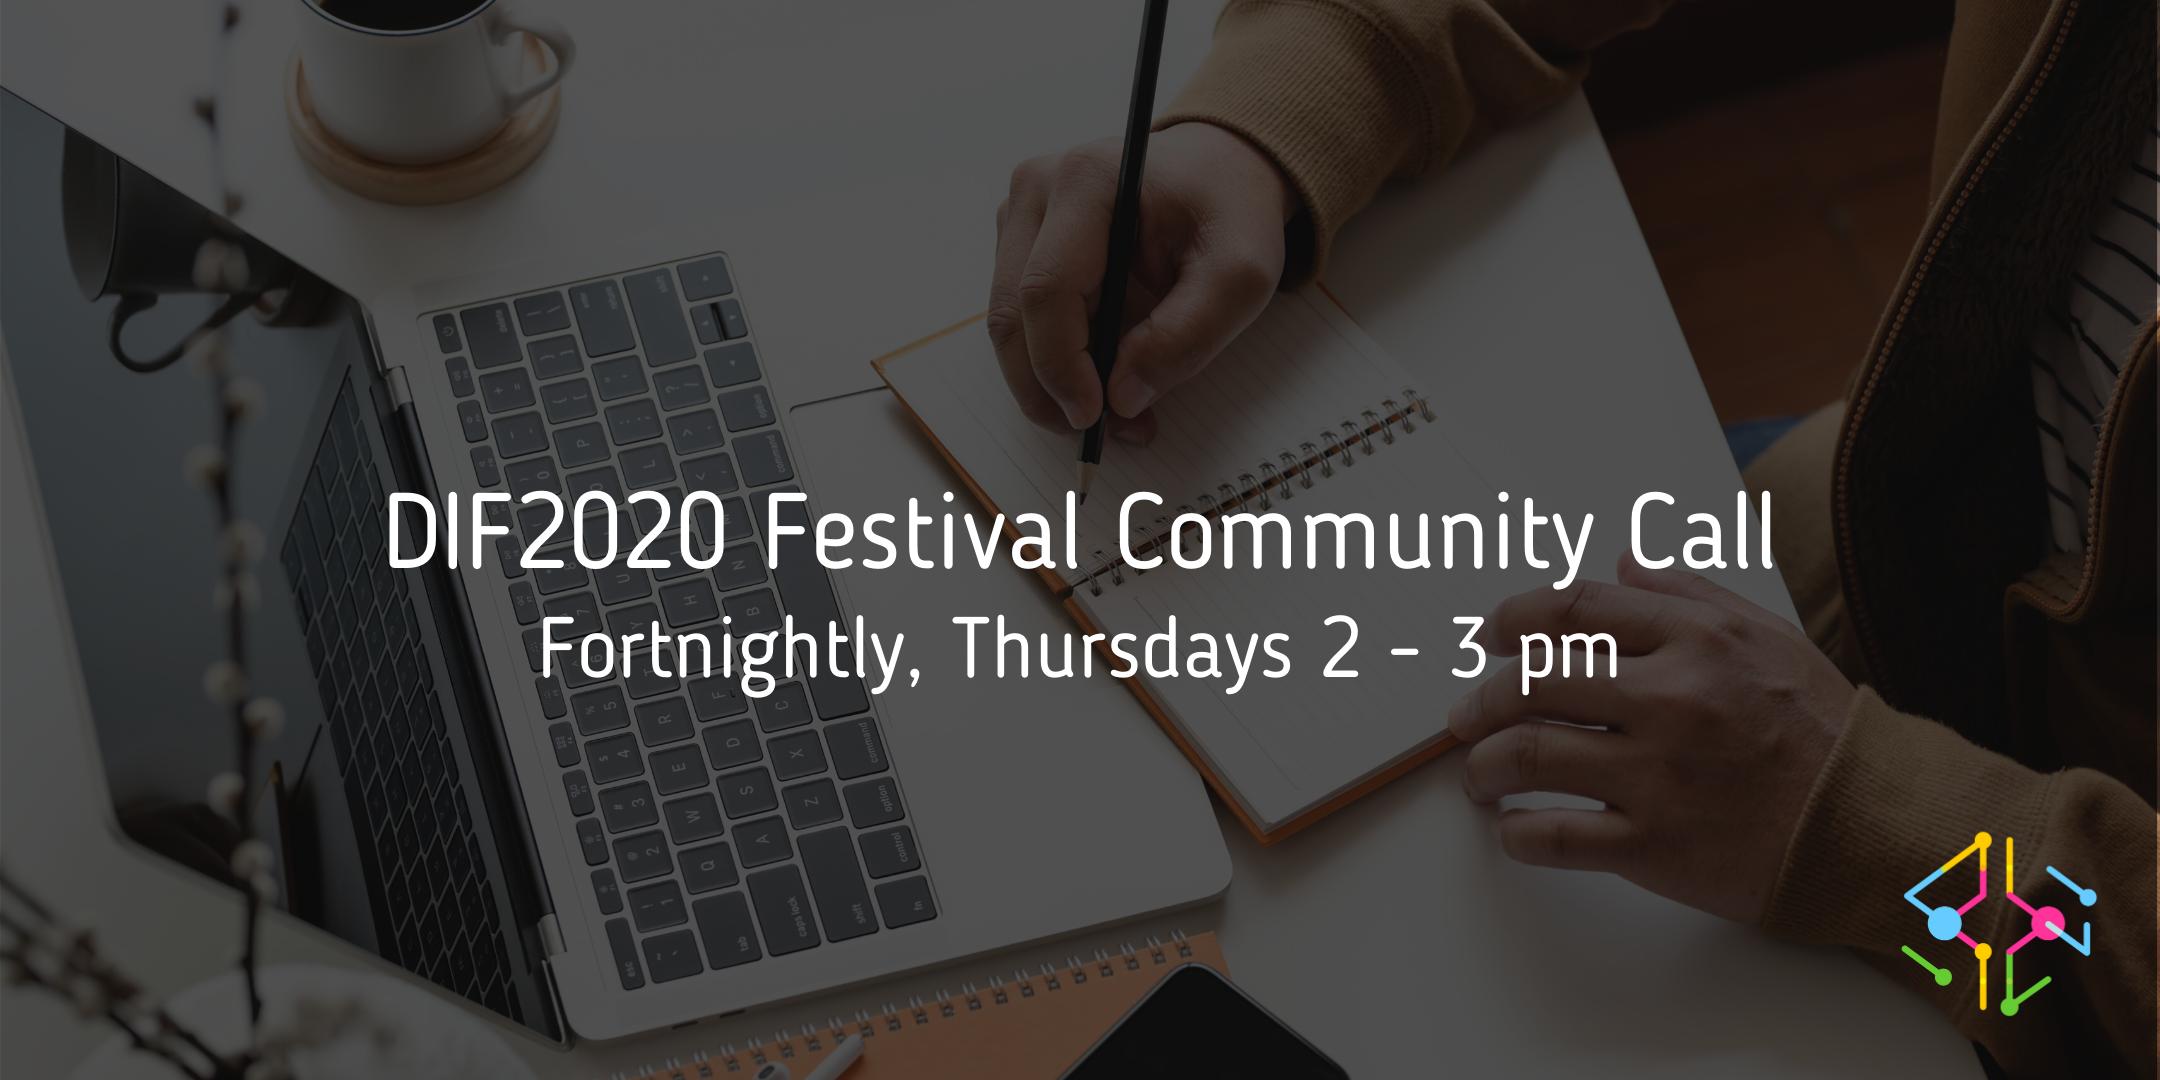 DIF2020 Festival Community Call. Fortnightly, Thursdays 2-3pm